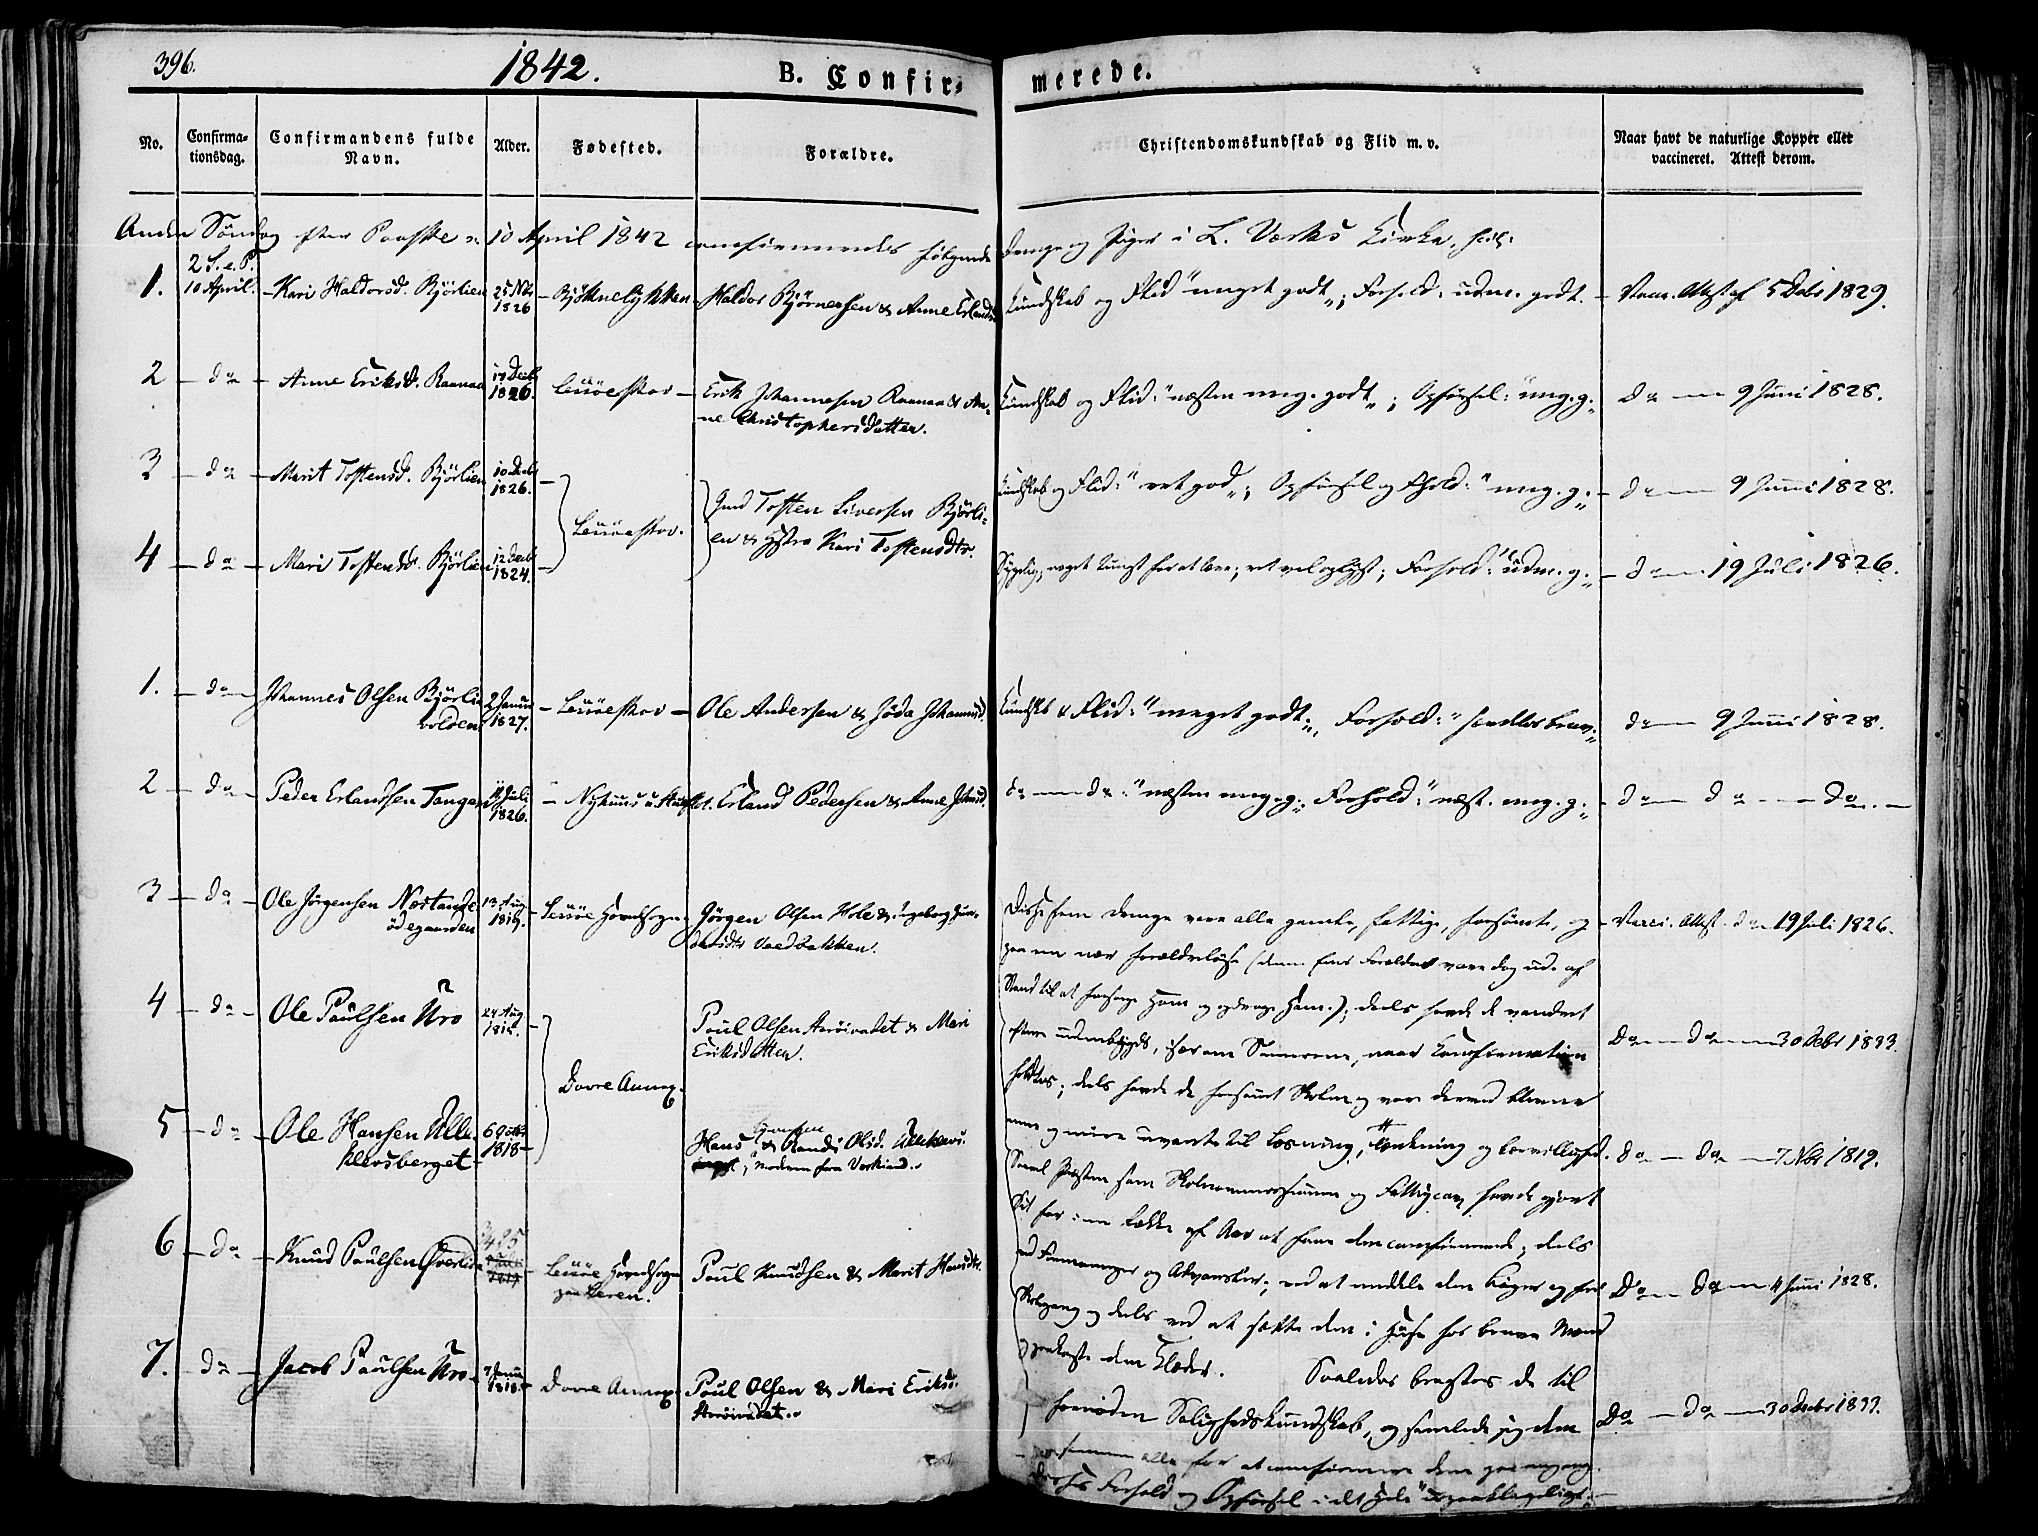 SAH, Lesja prestekontor, Ministerialbok nr. 5, 1830-1842, s. 396